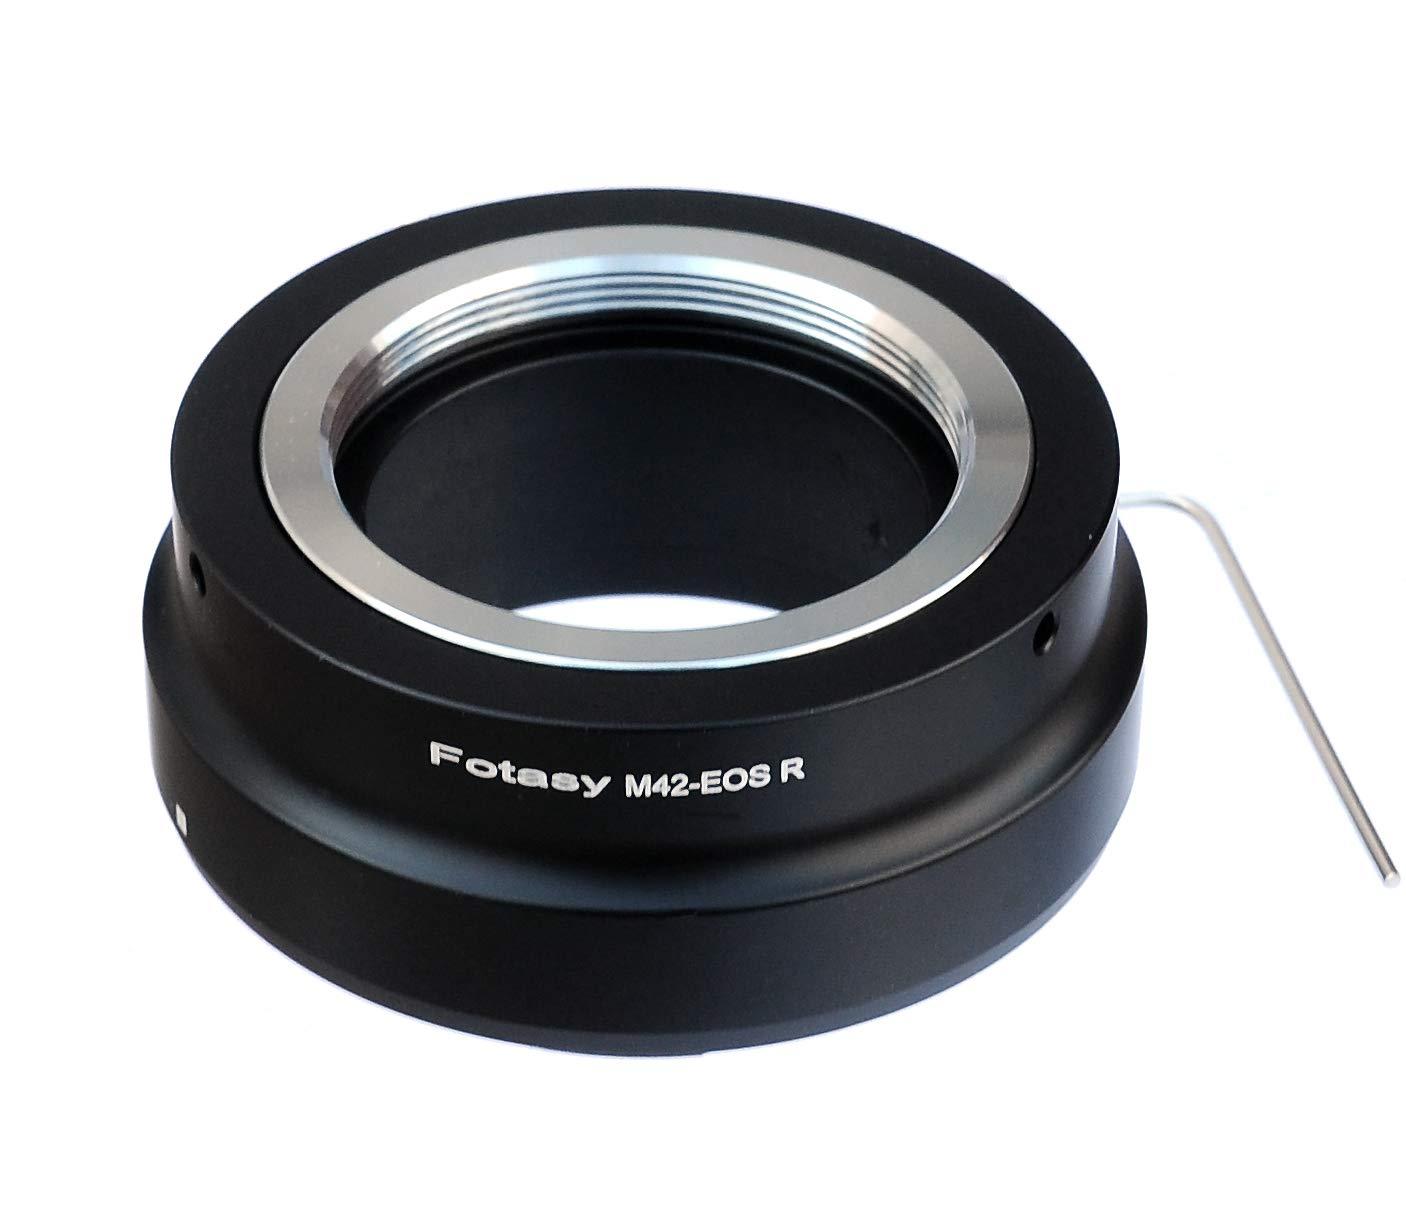 FocusFoto 9th Gen AF Confirm Adapter for Pentax K PK Lens to Canon EOS EF EF-S Mount Camera 80D 77D 70D 60D 5D Mark II III 5D2 5D3 7D 6D 3000D 1500D 1300D 1200D 800D 760D 750D 700D 650D 100D